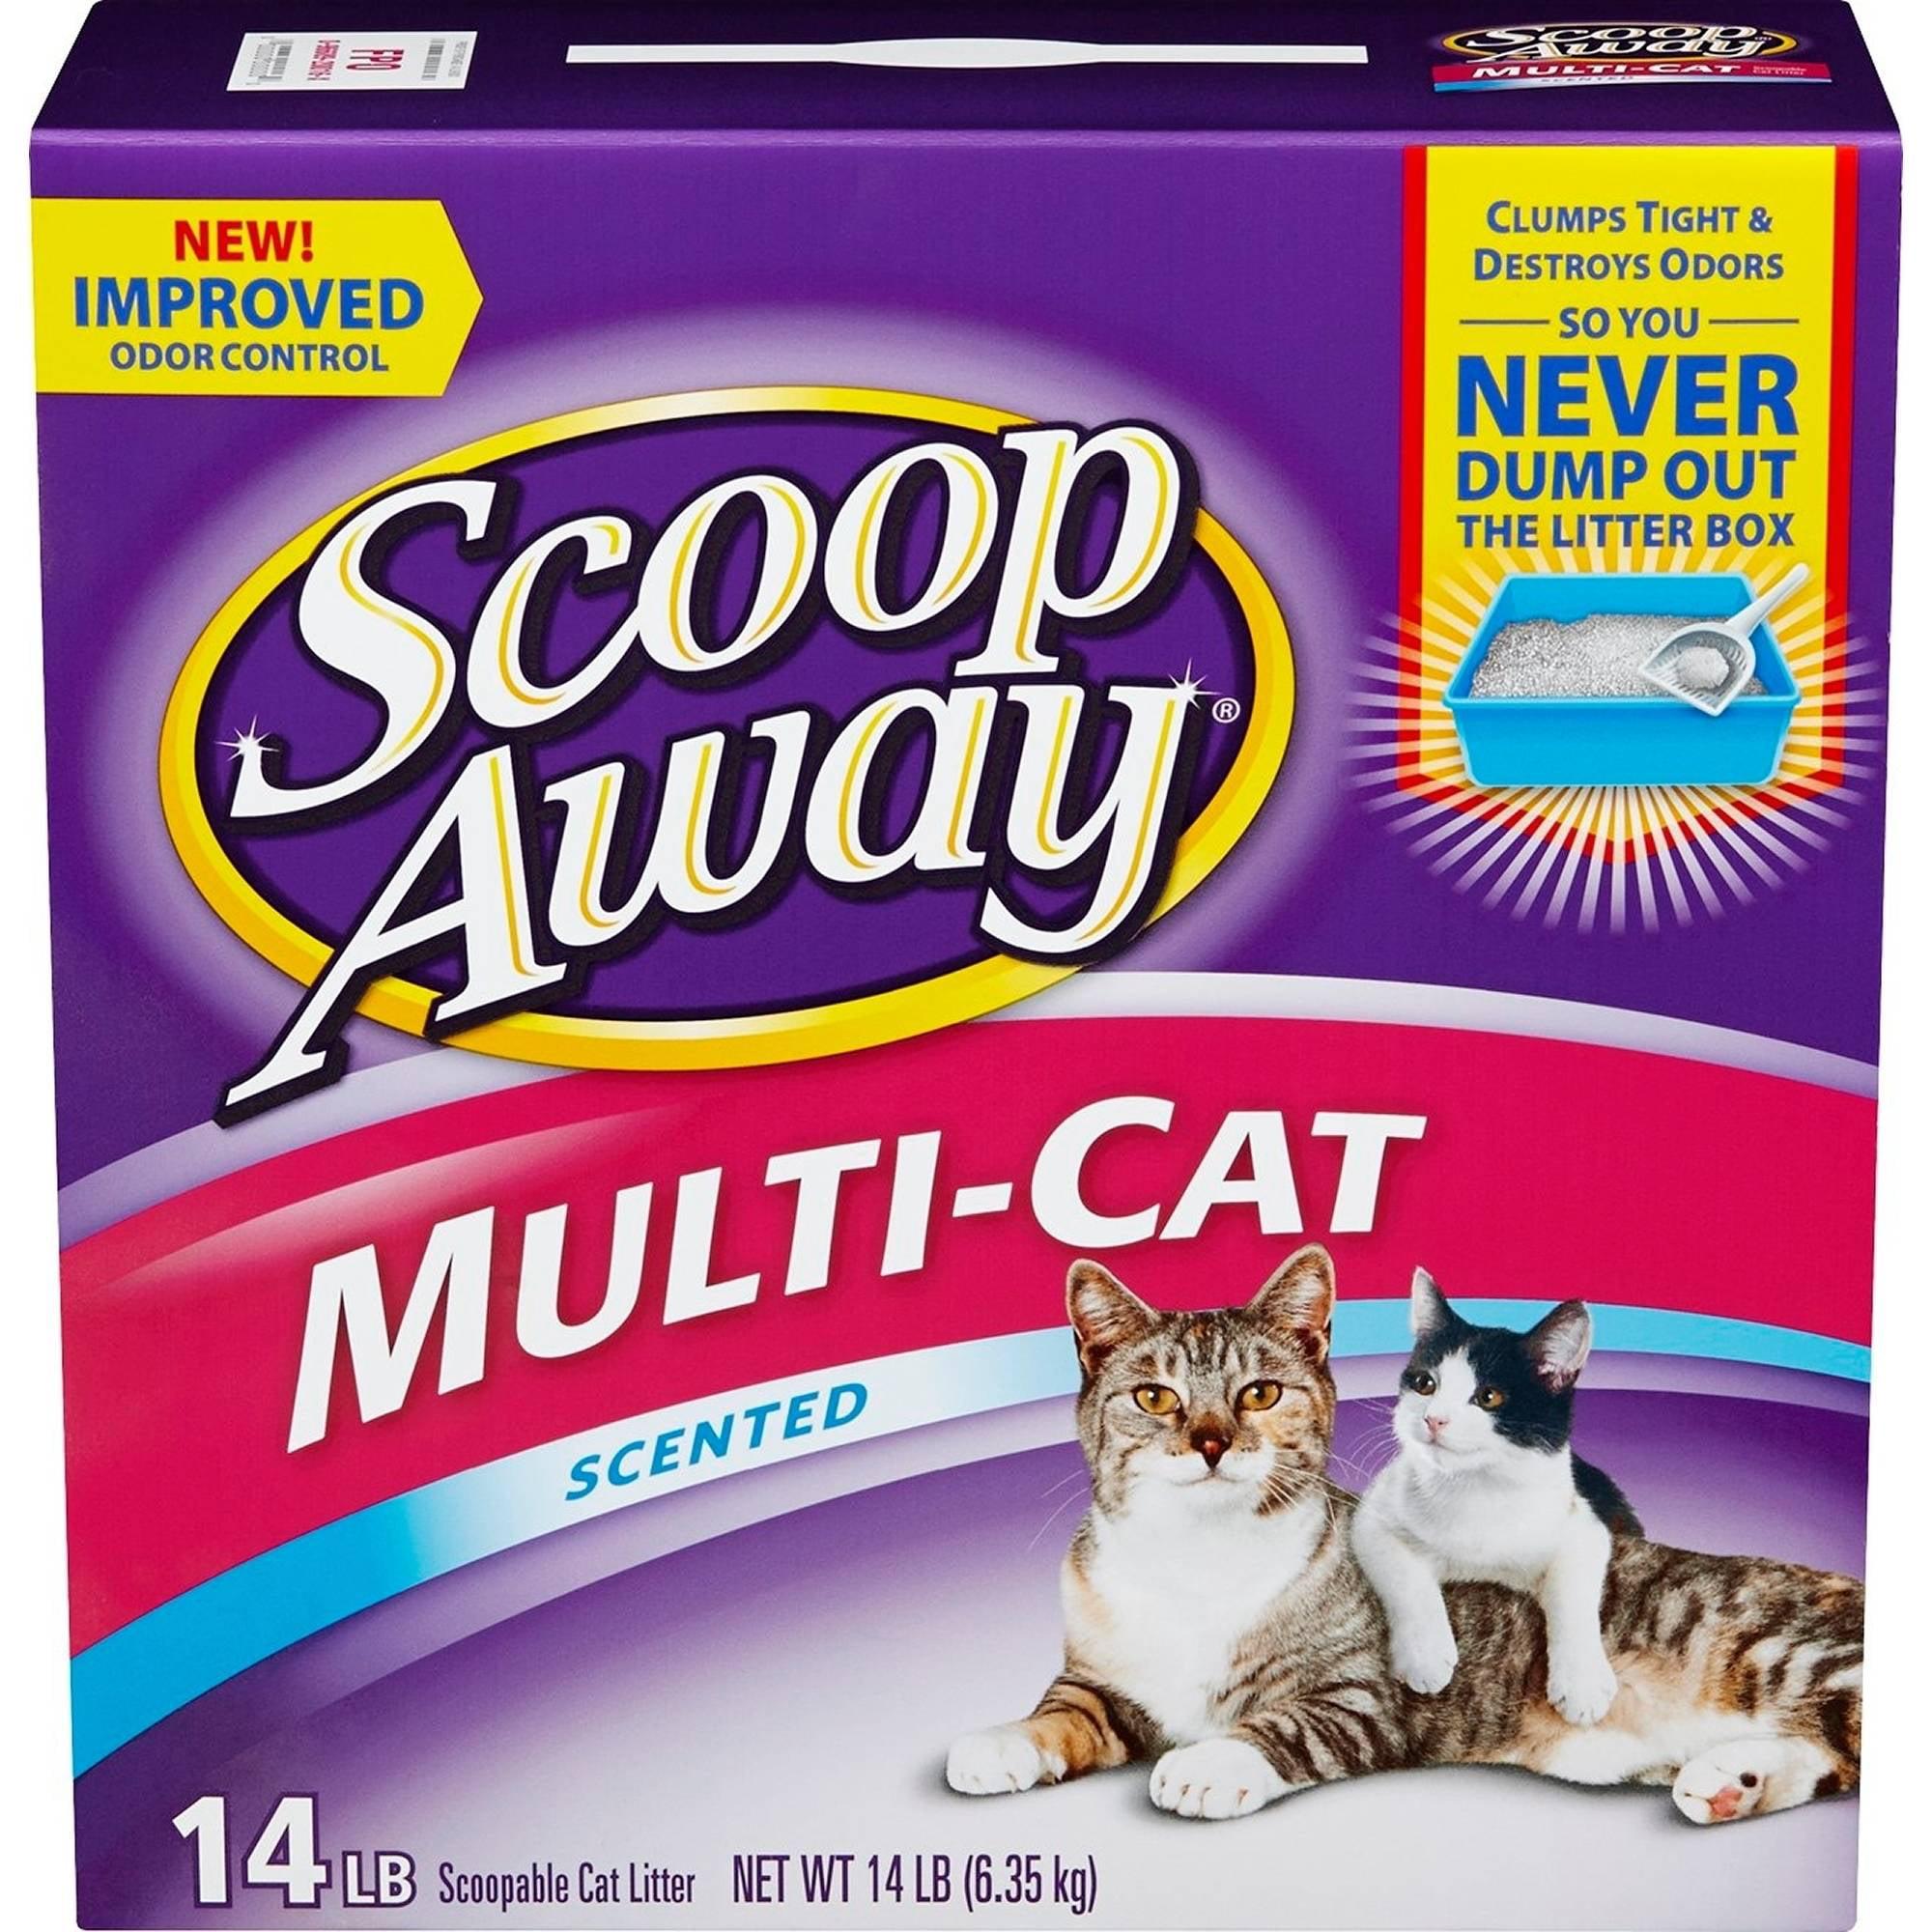 Scoop AwayMulti-Cat, Scented Cat Litter, 14 lb Box